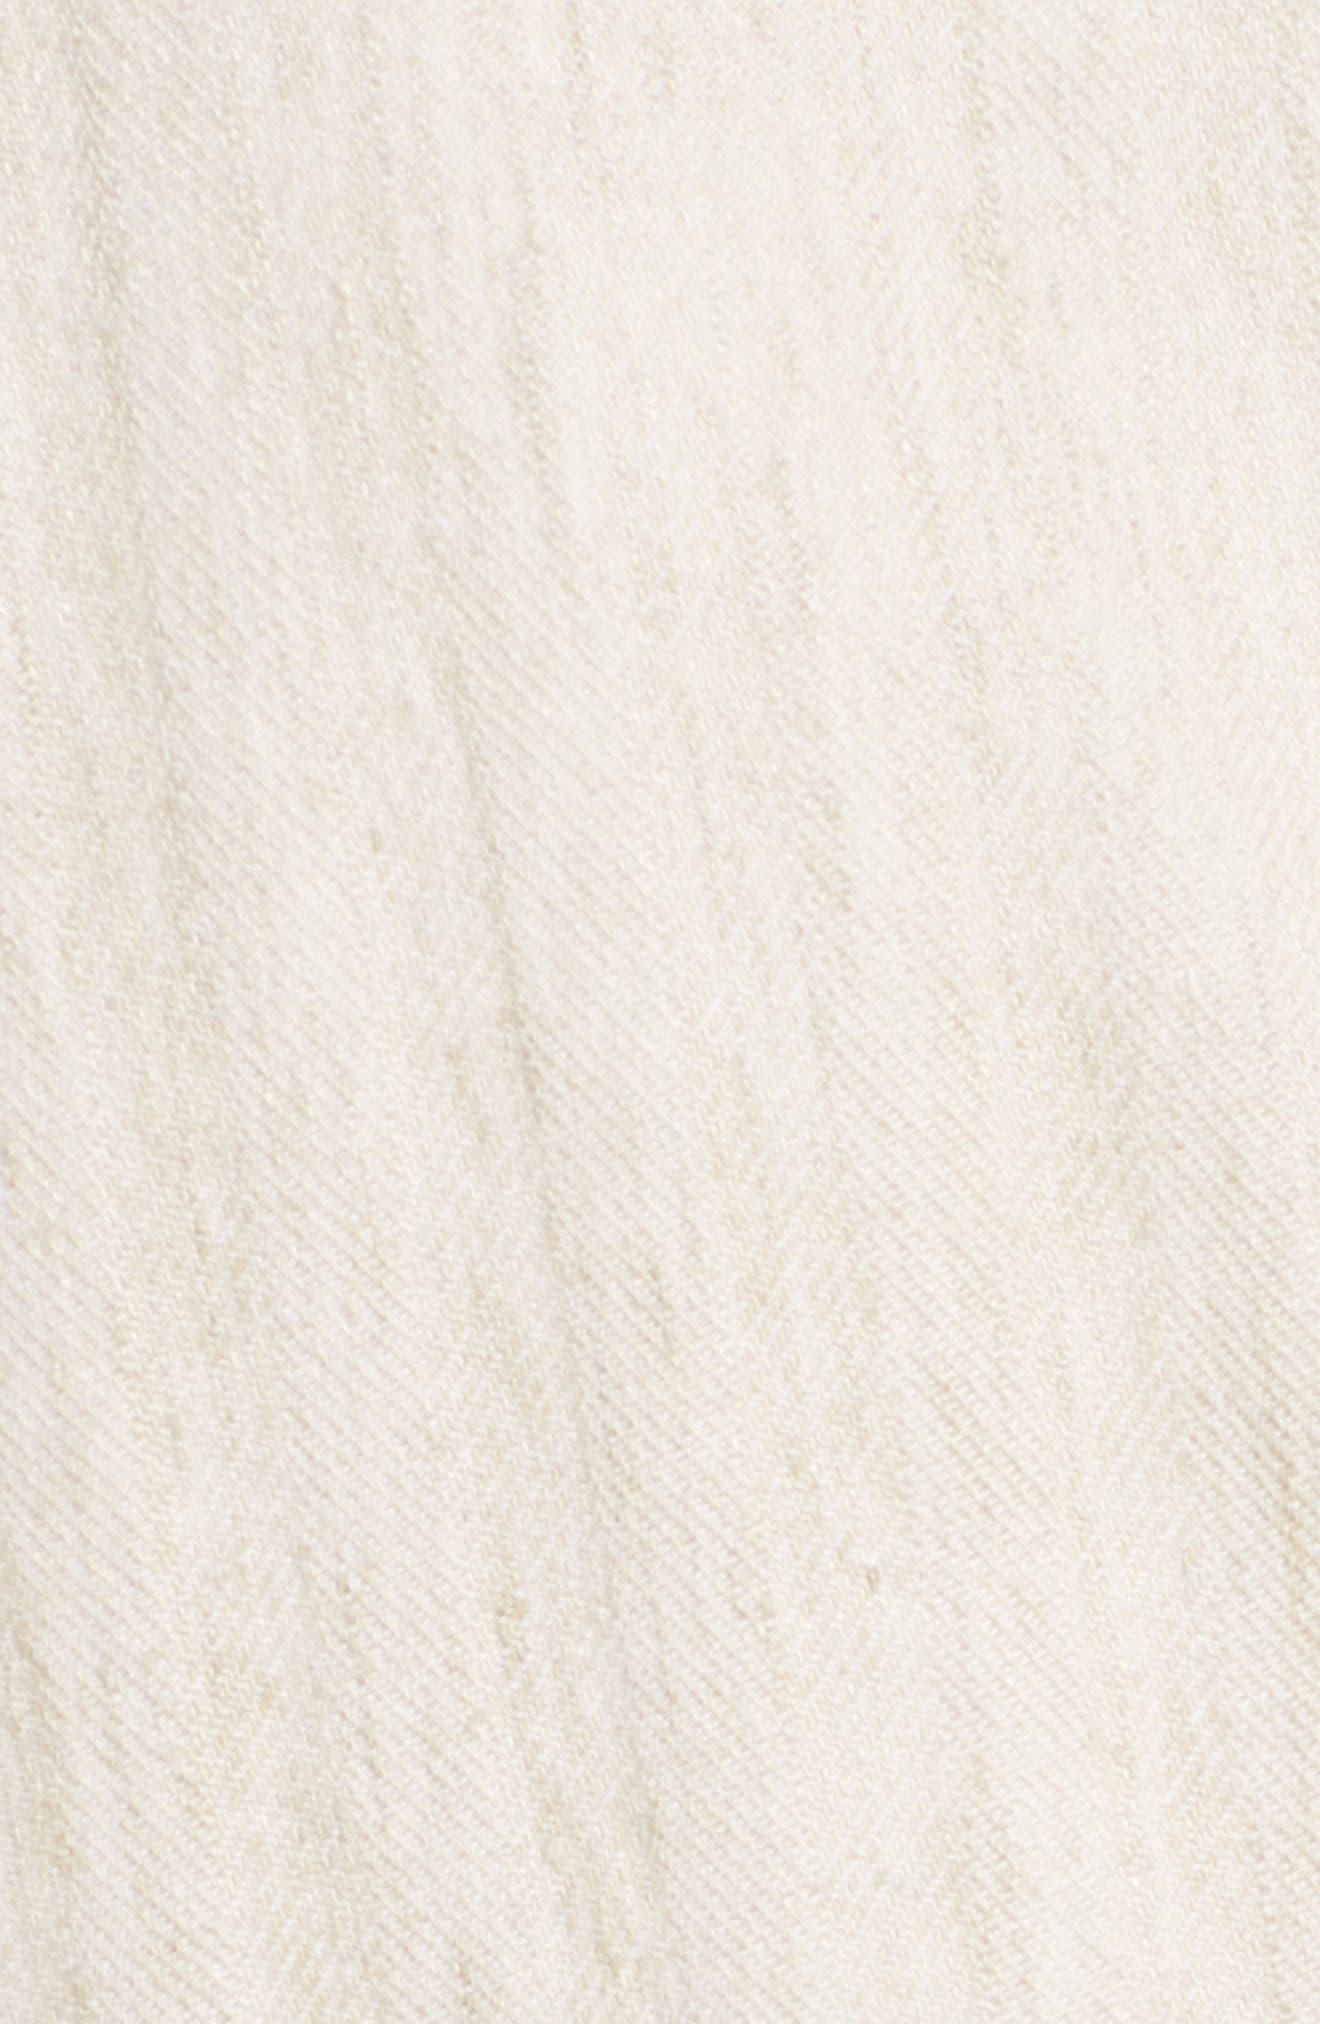 Regular Fit Herringbone Cotton & Linen Blazer,                             Alternate thumbnail 6, color,                             200